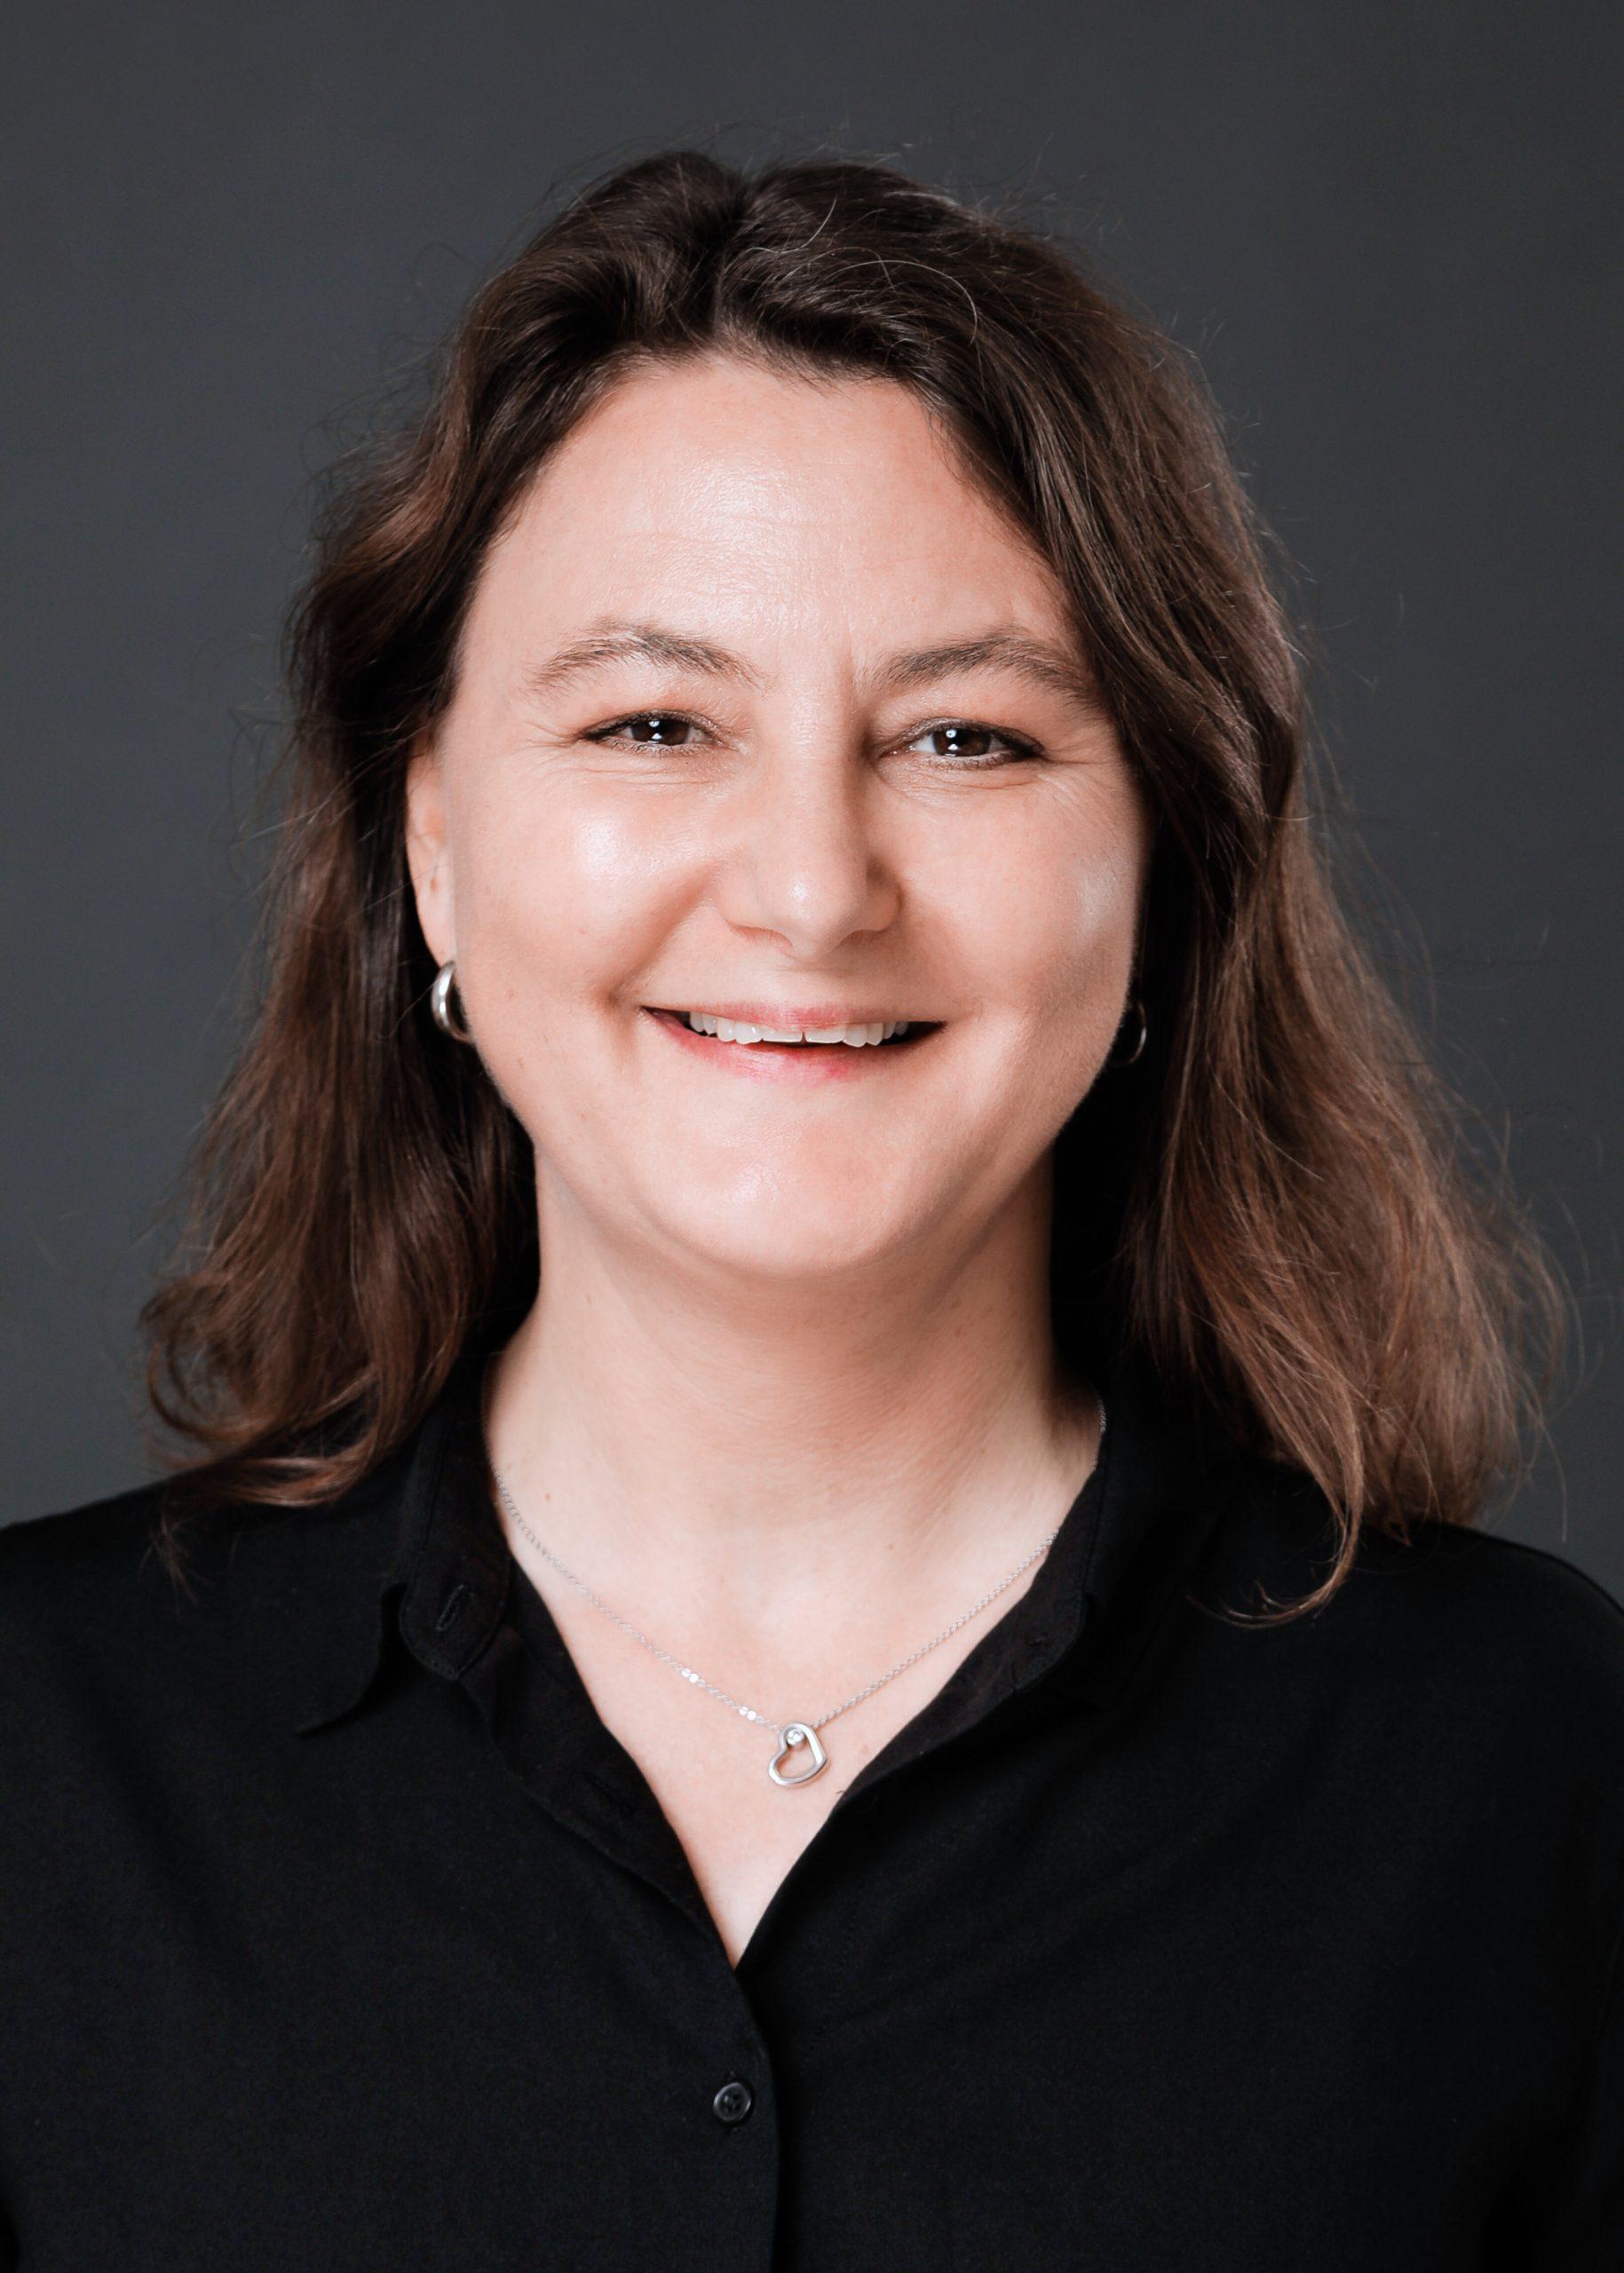 Bianca Mettke